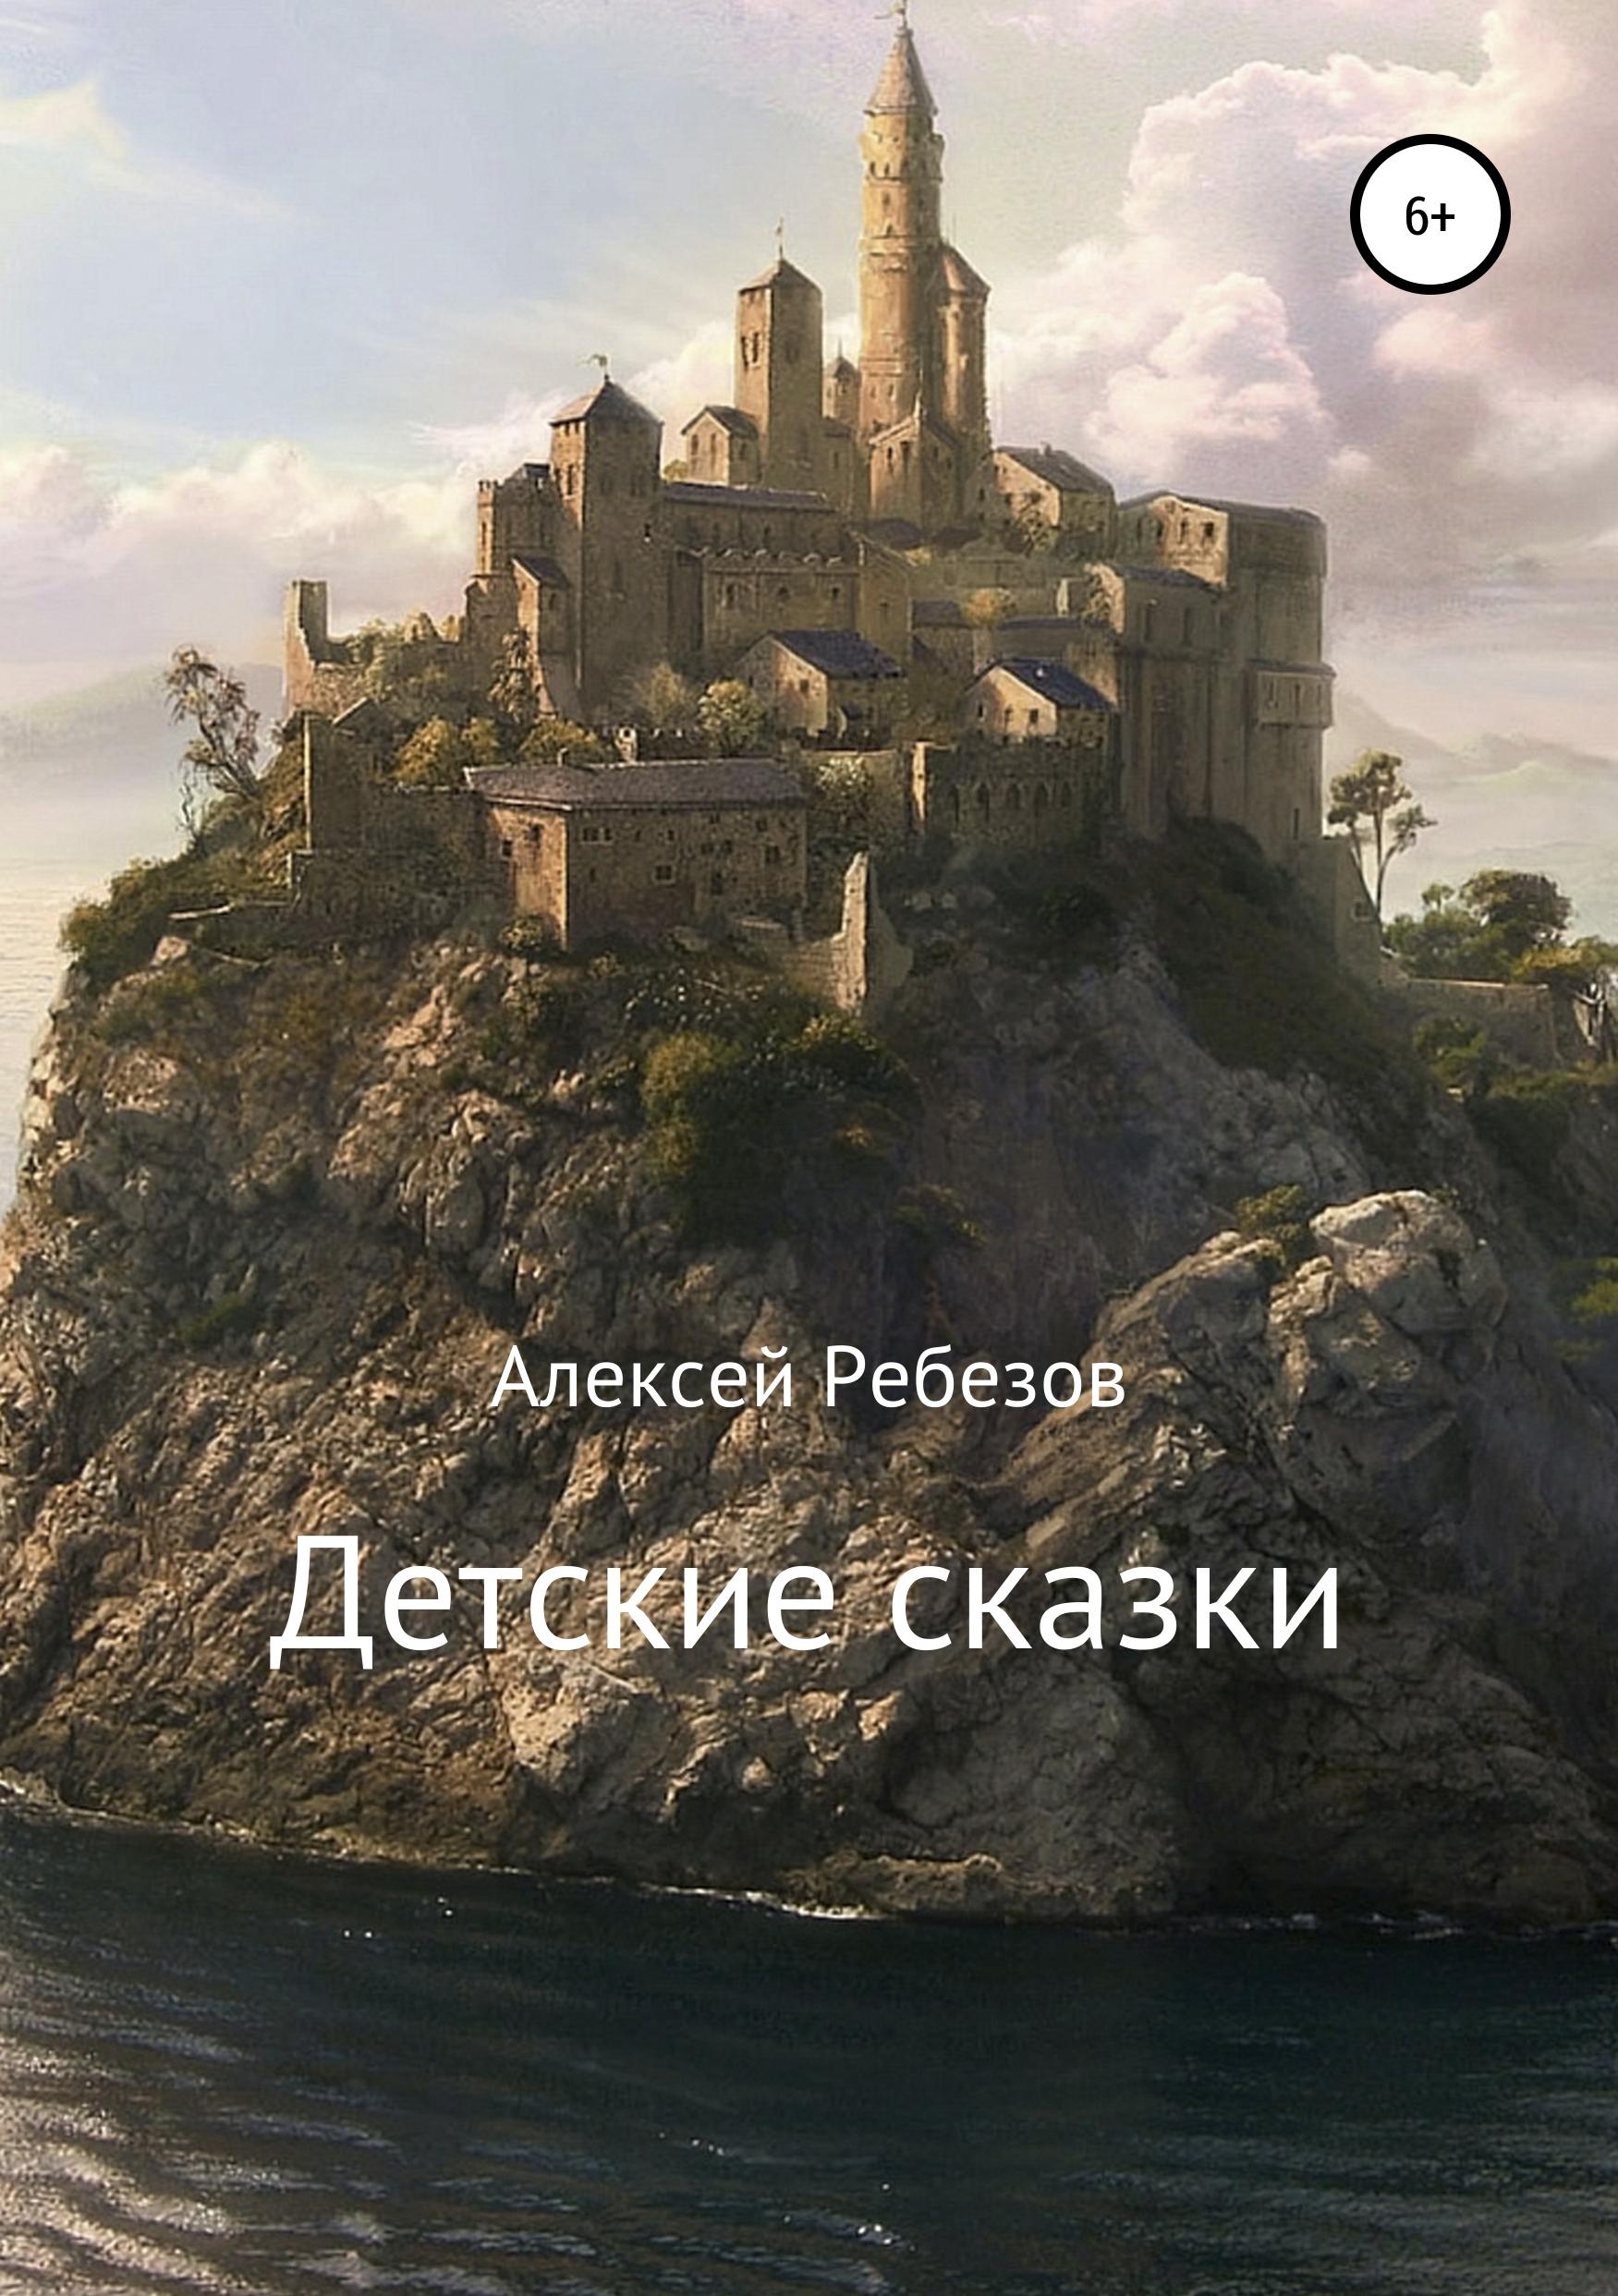 Алексей Ребезов Детские сказки ева рейман сказочная детские сказки